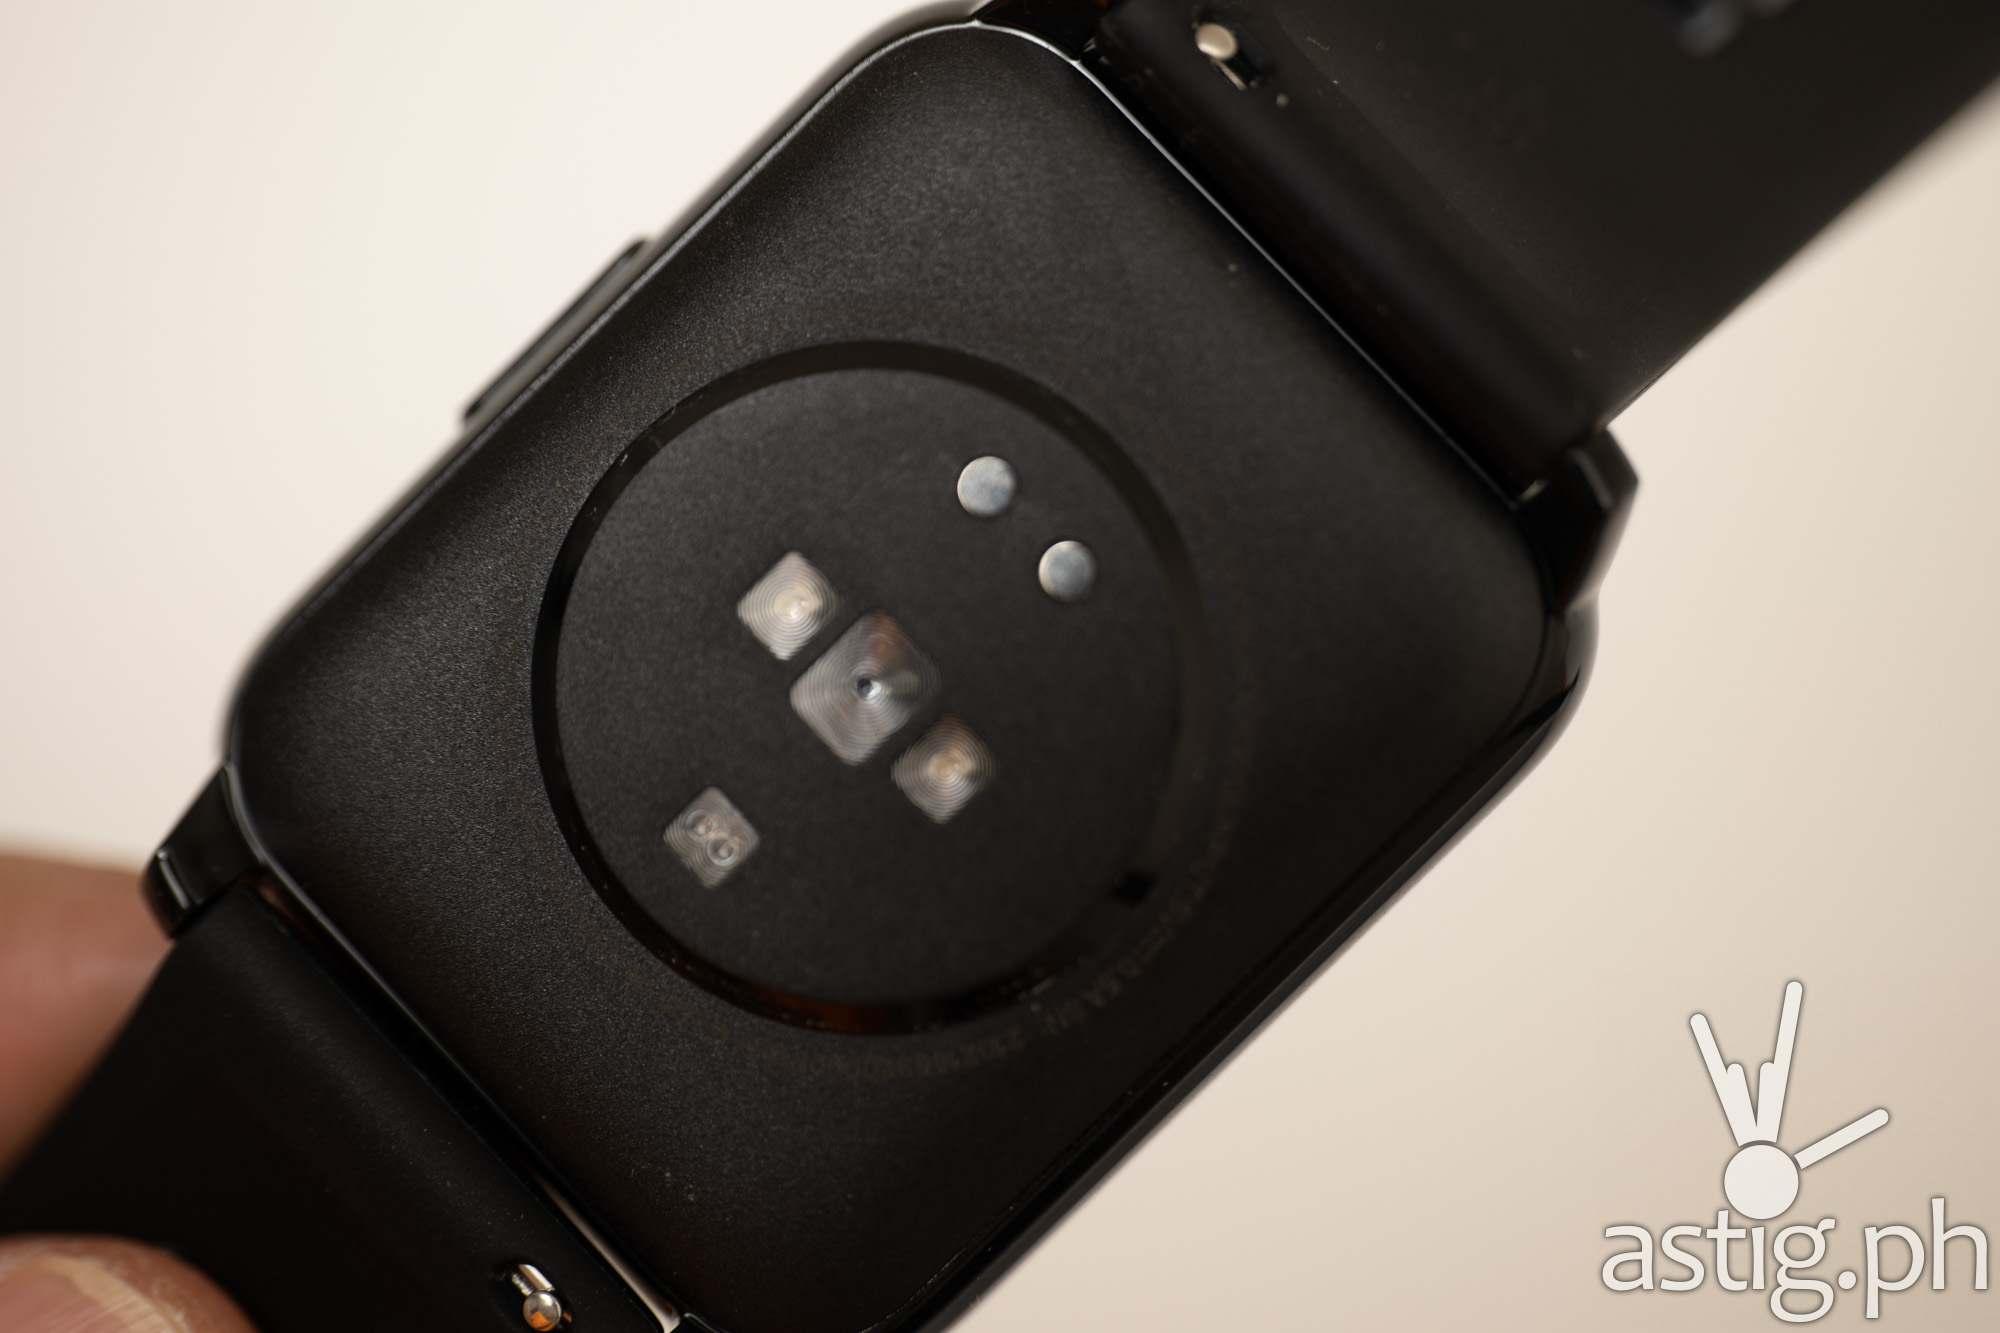 Rear sensors - realme Watch 2 (Philippines)